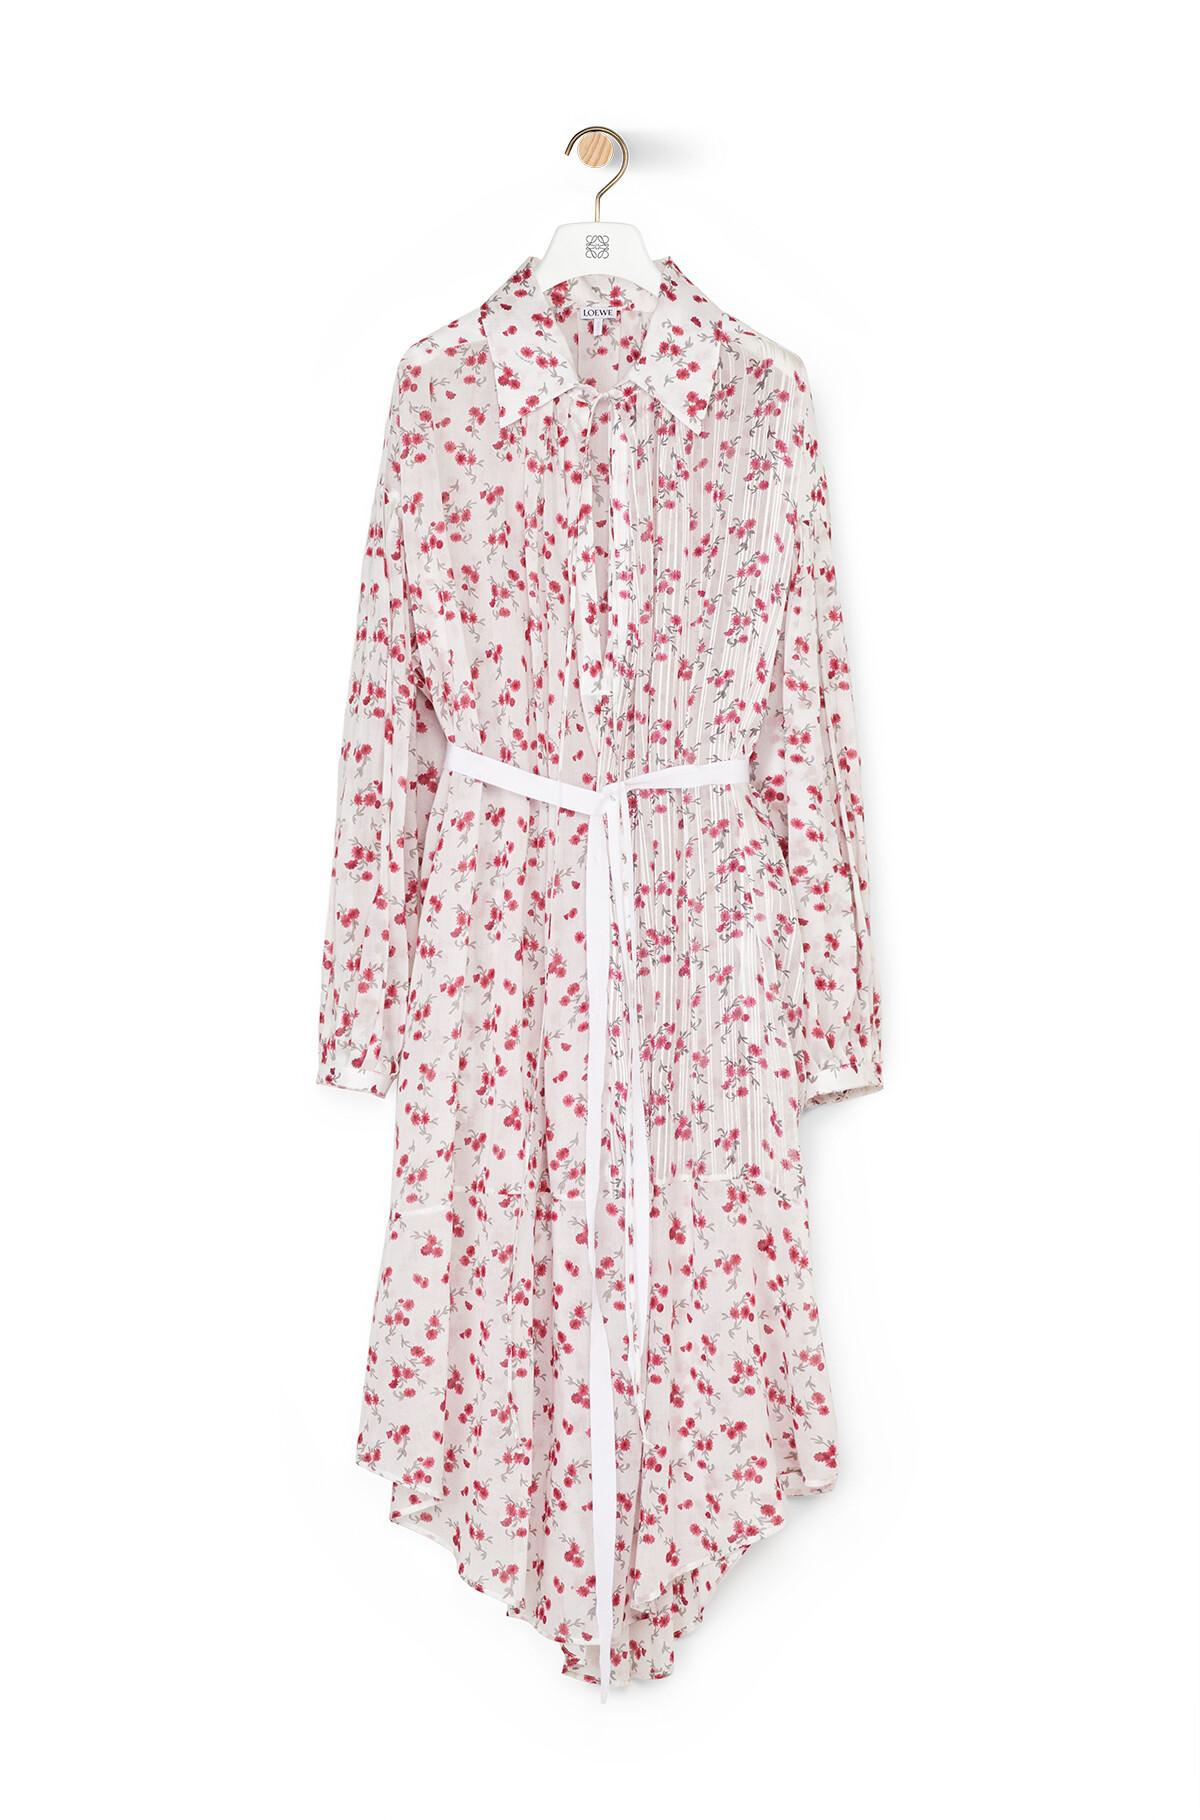 LOEWE Flower Print Shirtdress Blanco/Rosa front